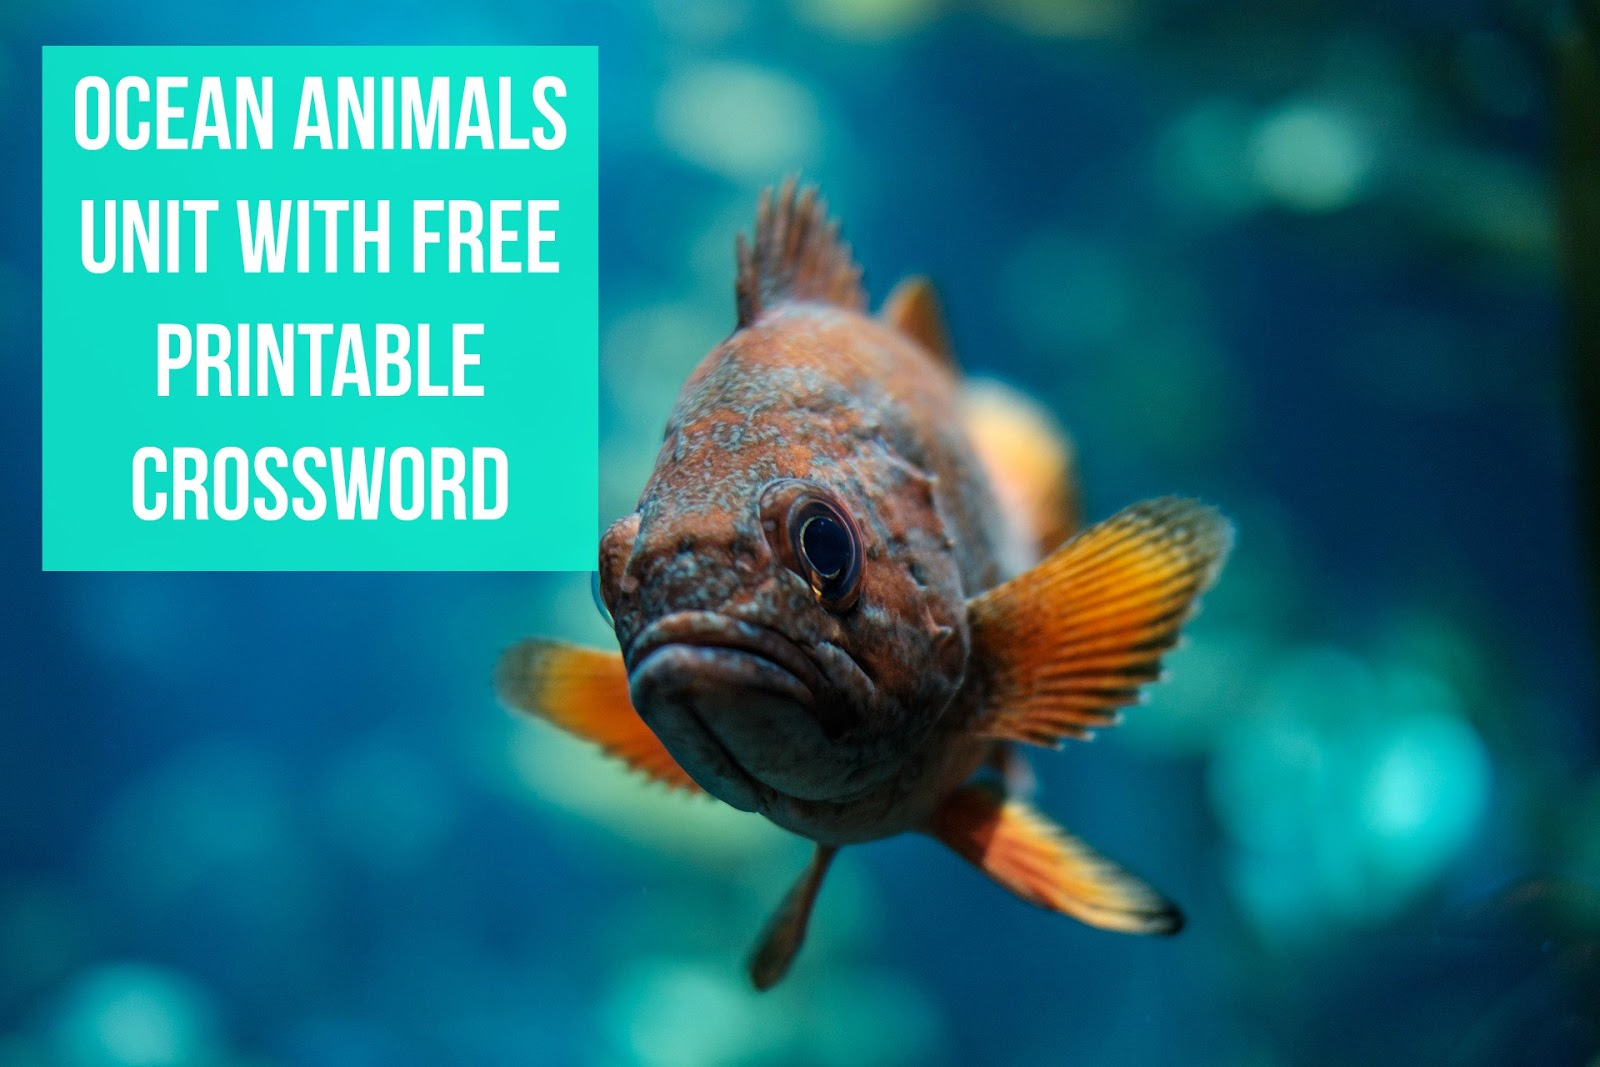 Ocean Animals Unit With Free Crossword Puzzle Printable